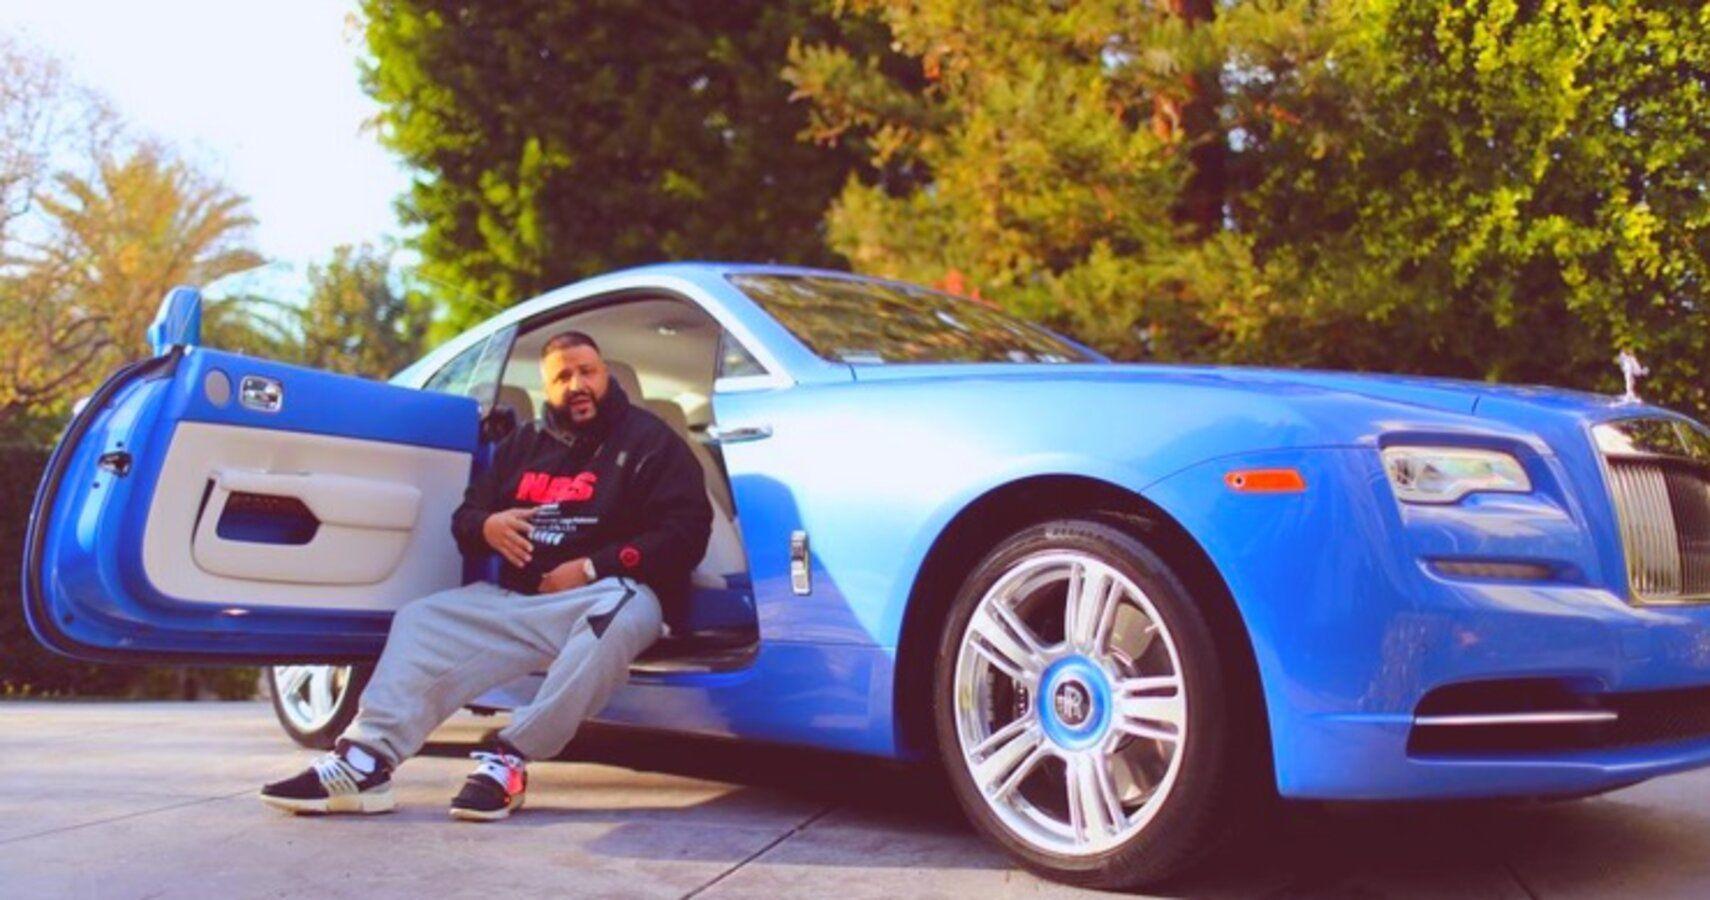 A Detailed Look At DJ Khaled's Rolls Royce Wraith | HotCars